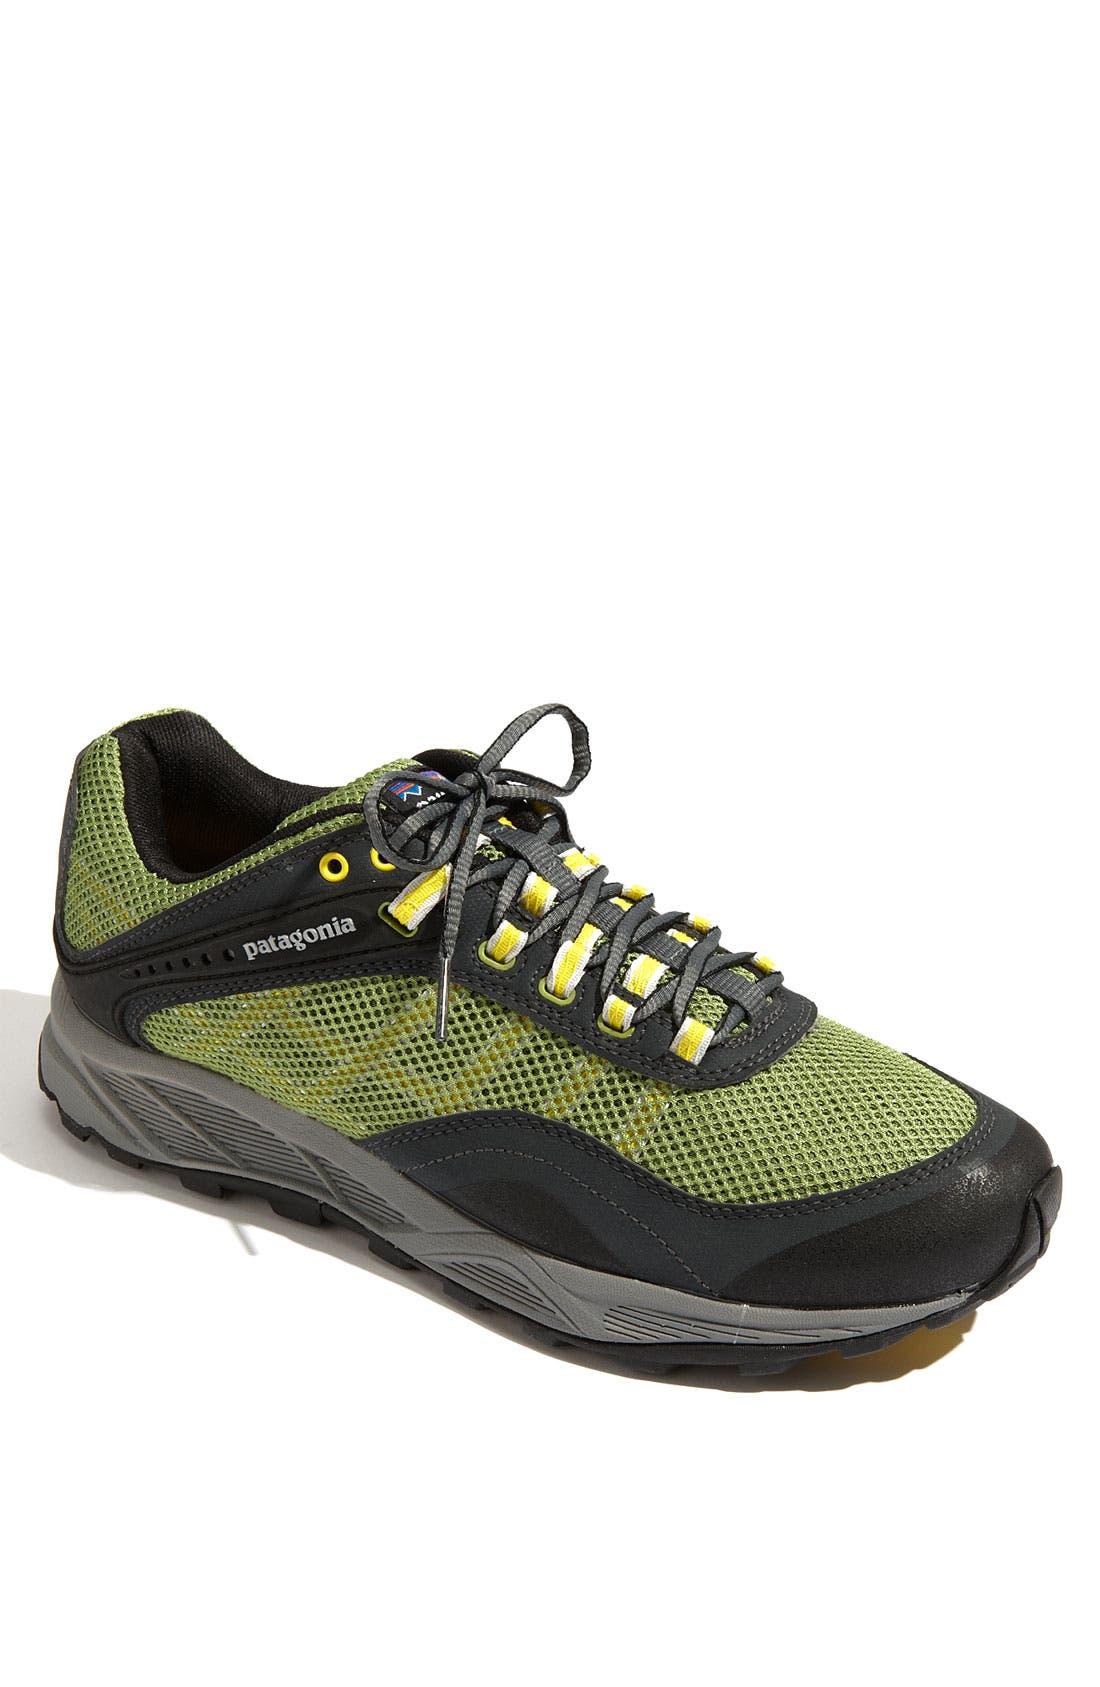 Alternate Image 1 Selected - Patagonia 'Specter' Trail Running Shoe (Men)